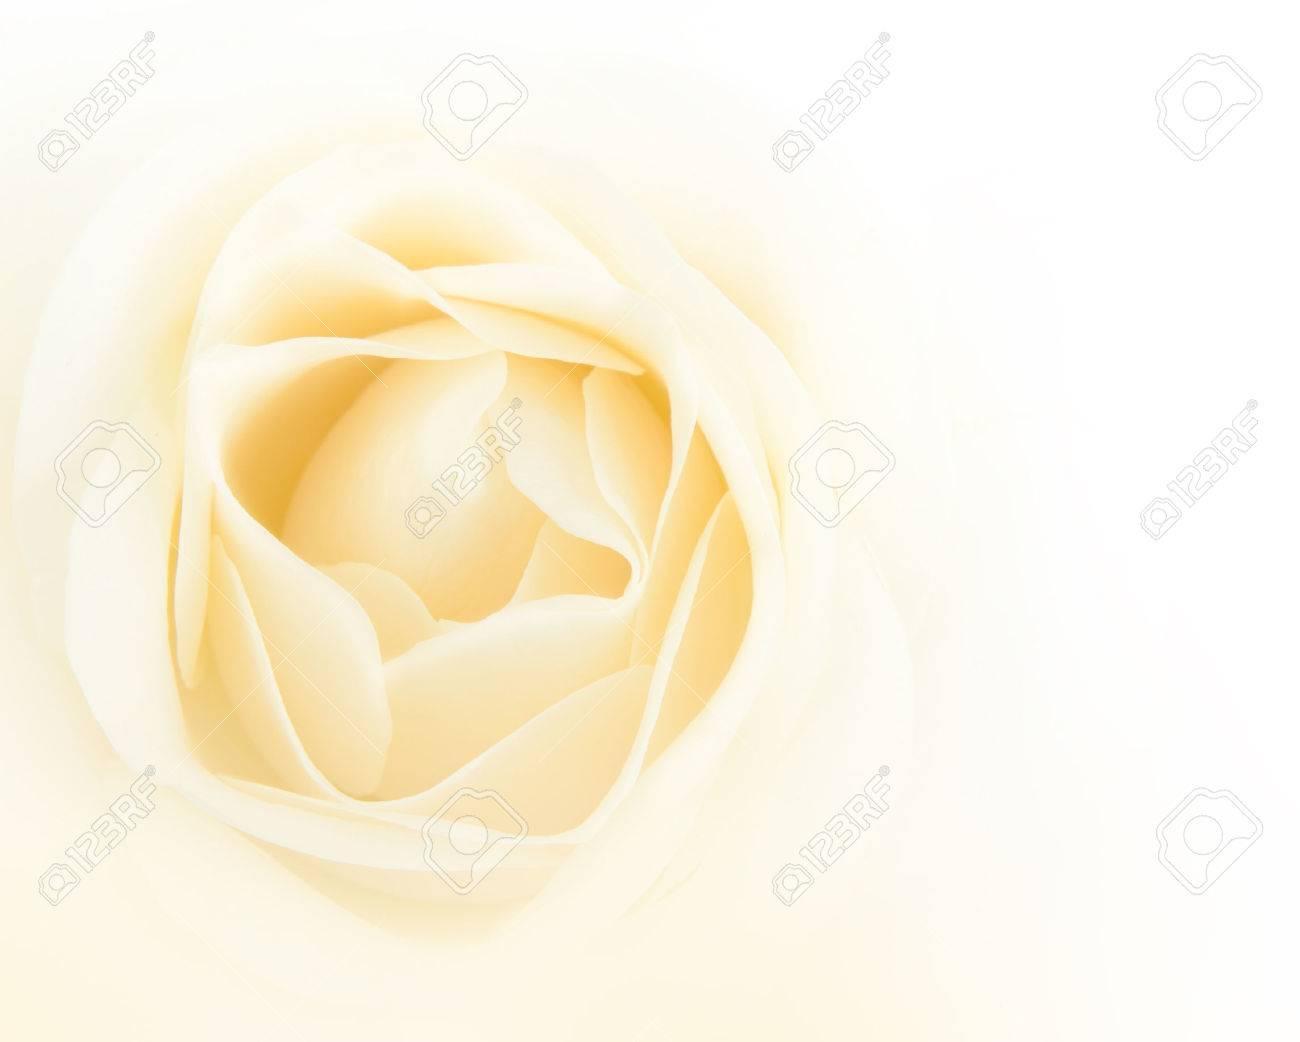 Single white rose flower background - 34240643